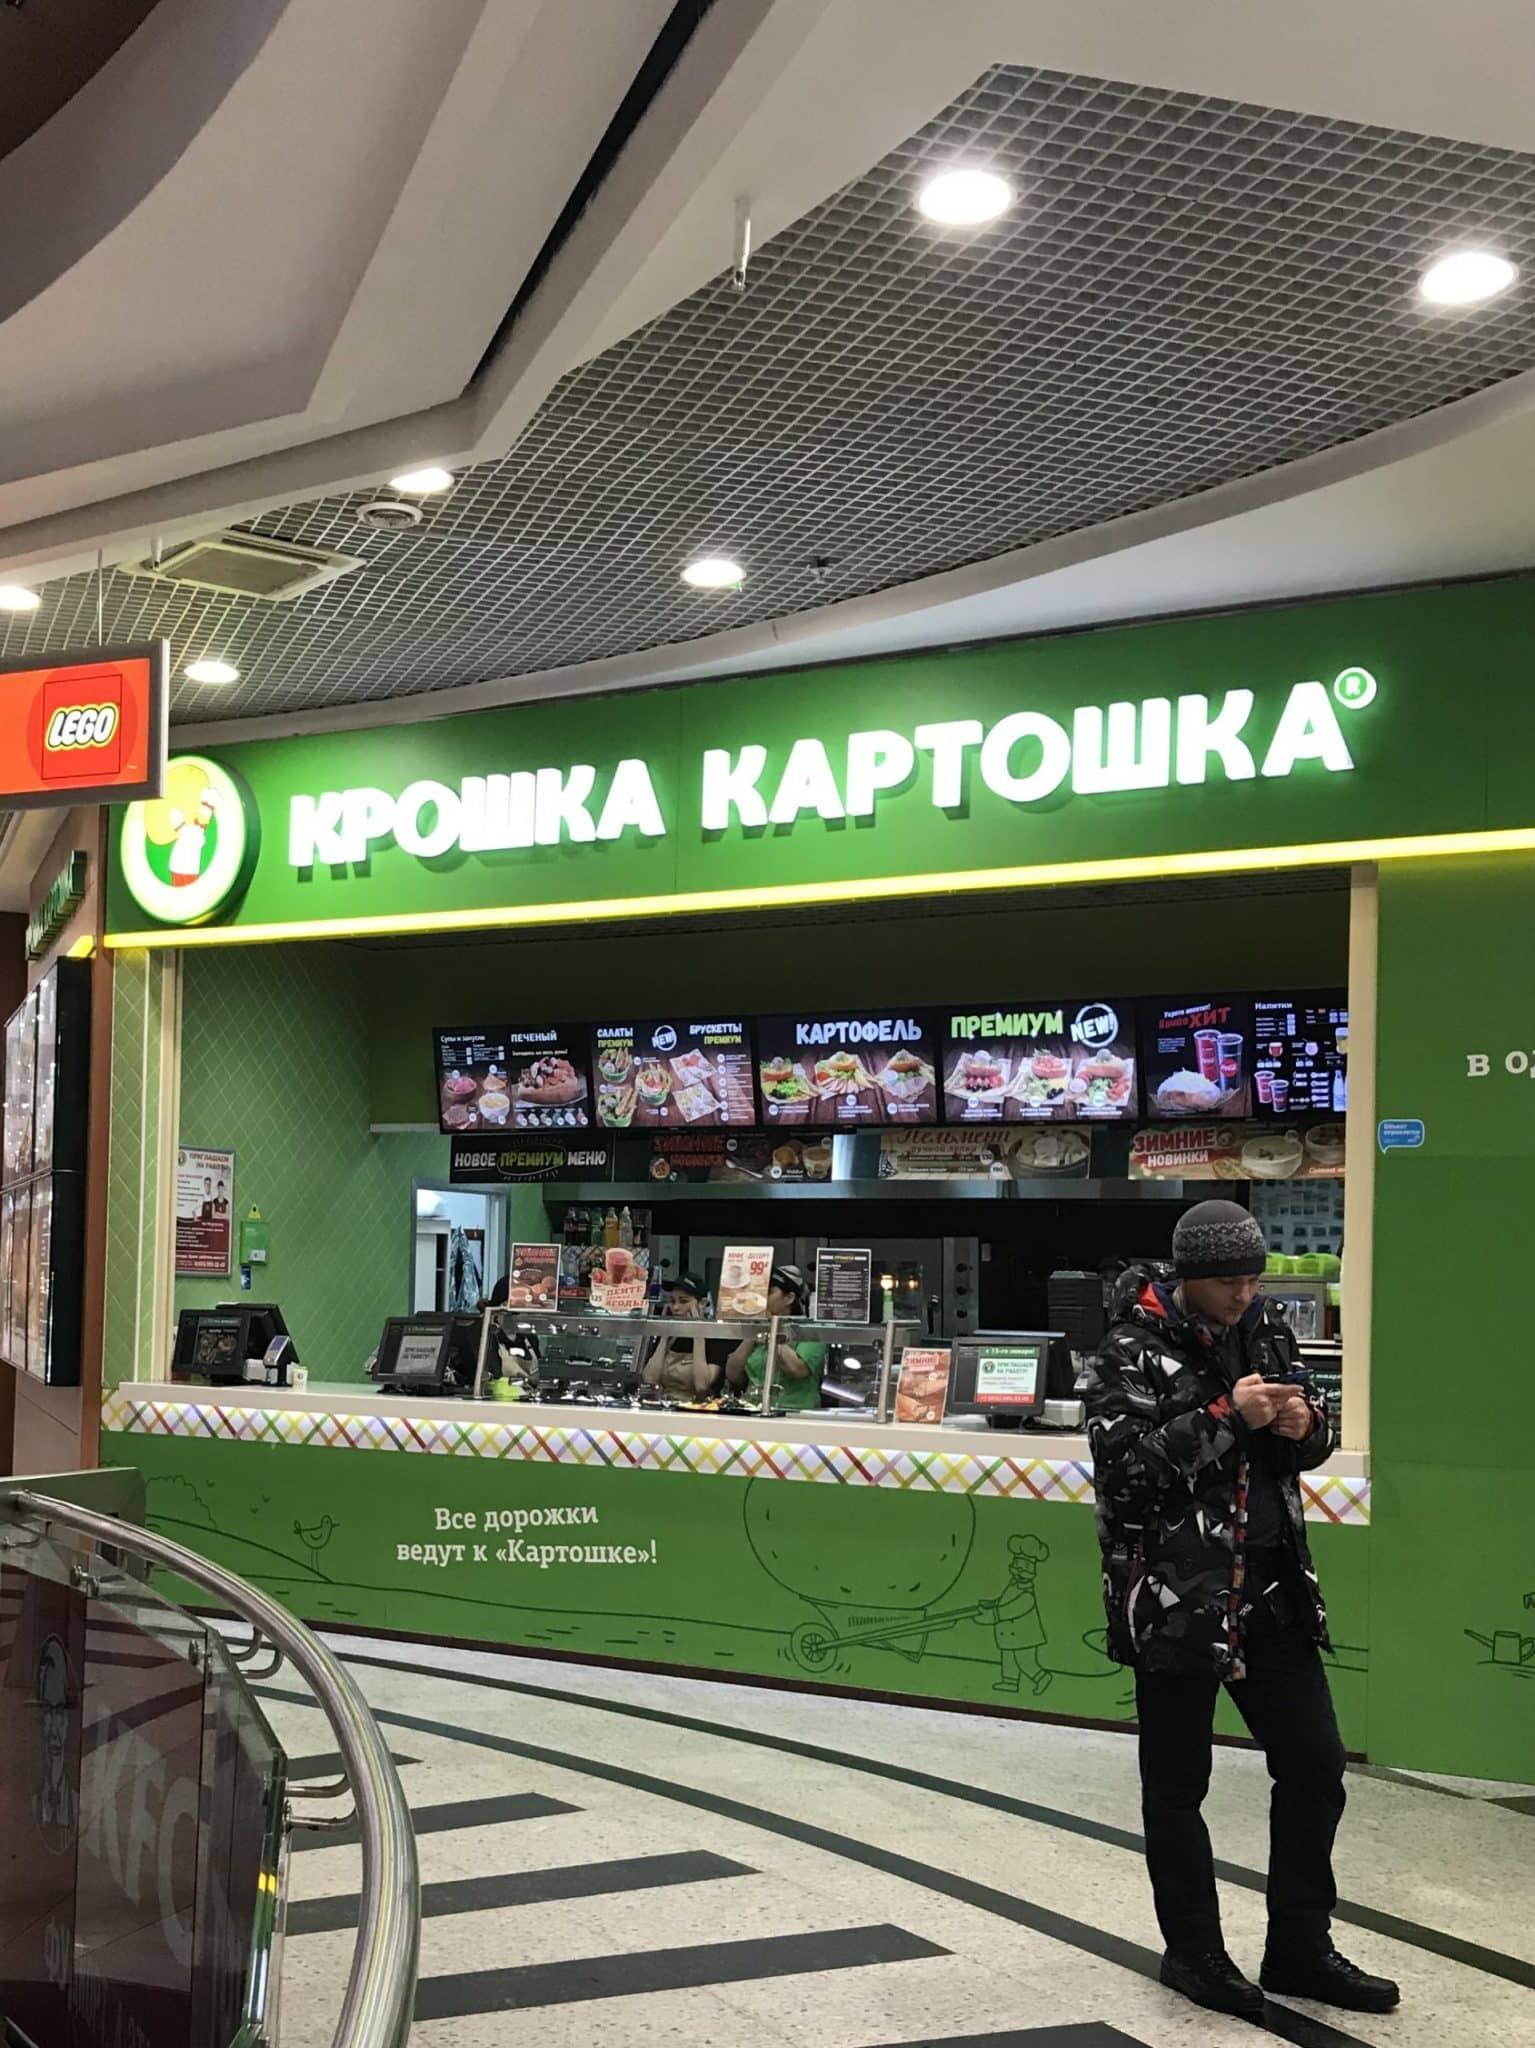 Kroshka Kartoshka Moscow